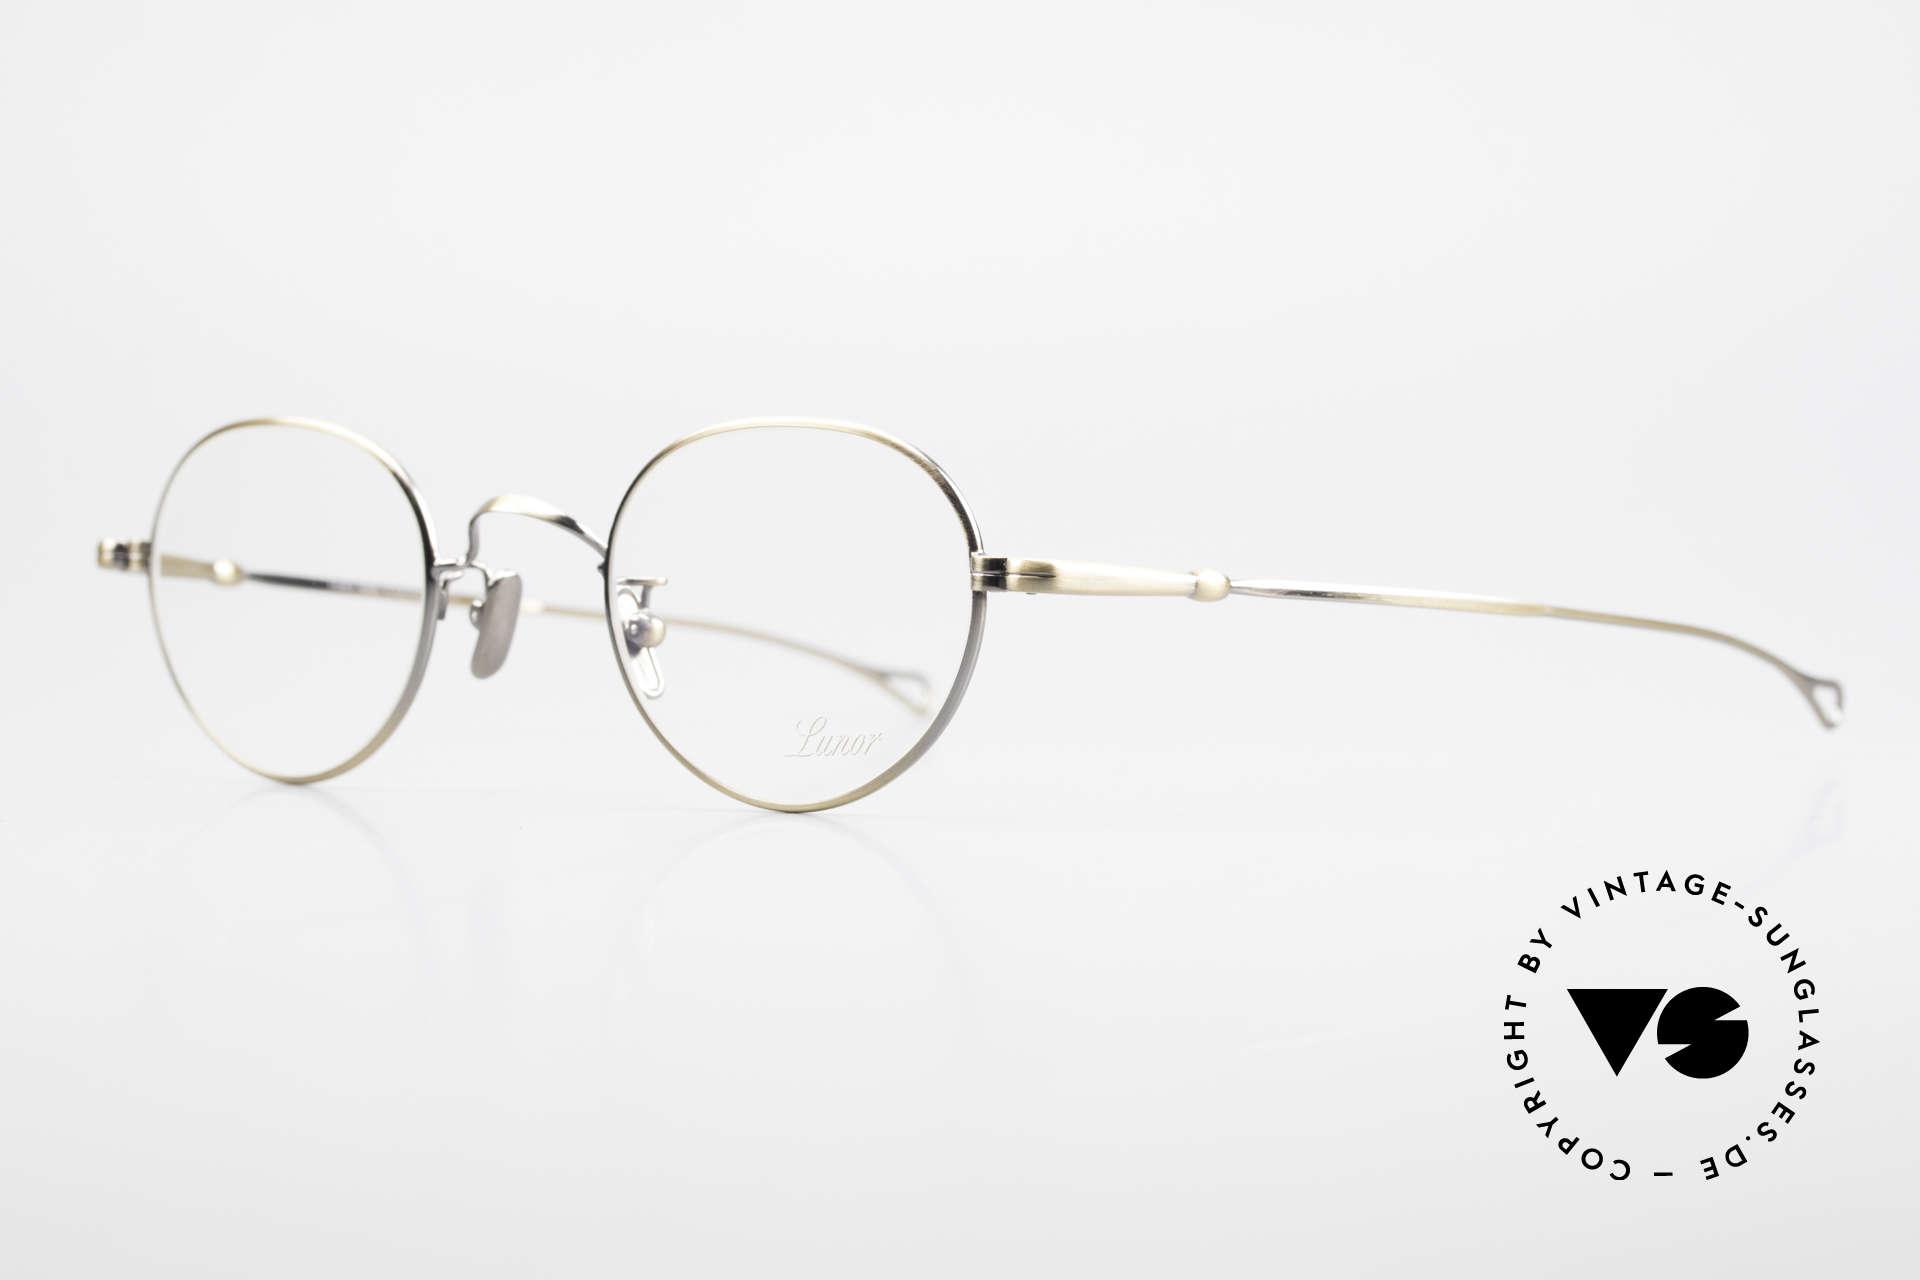 Lunor V 108 Metal Frame With Titanium Pads, model V 108: very elegant Panto glasses for gentlemen, Made for Men